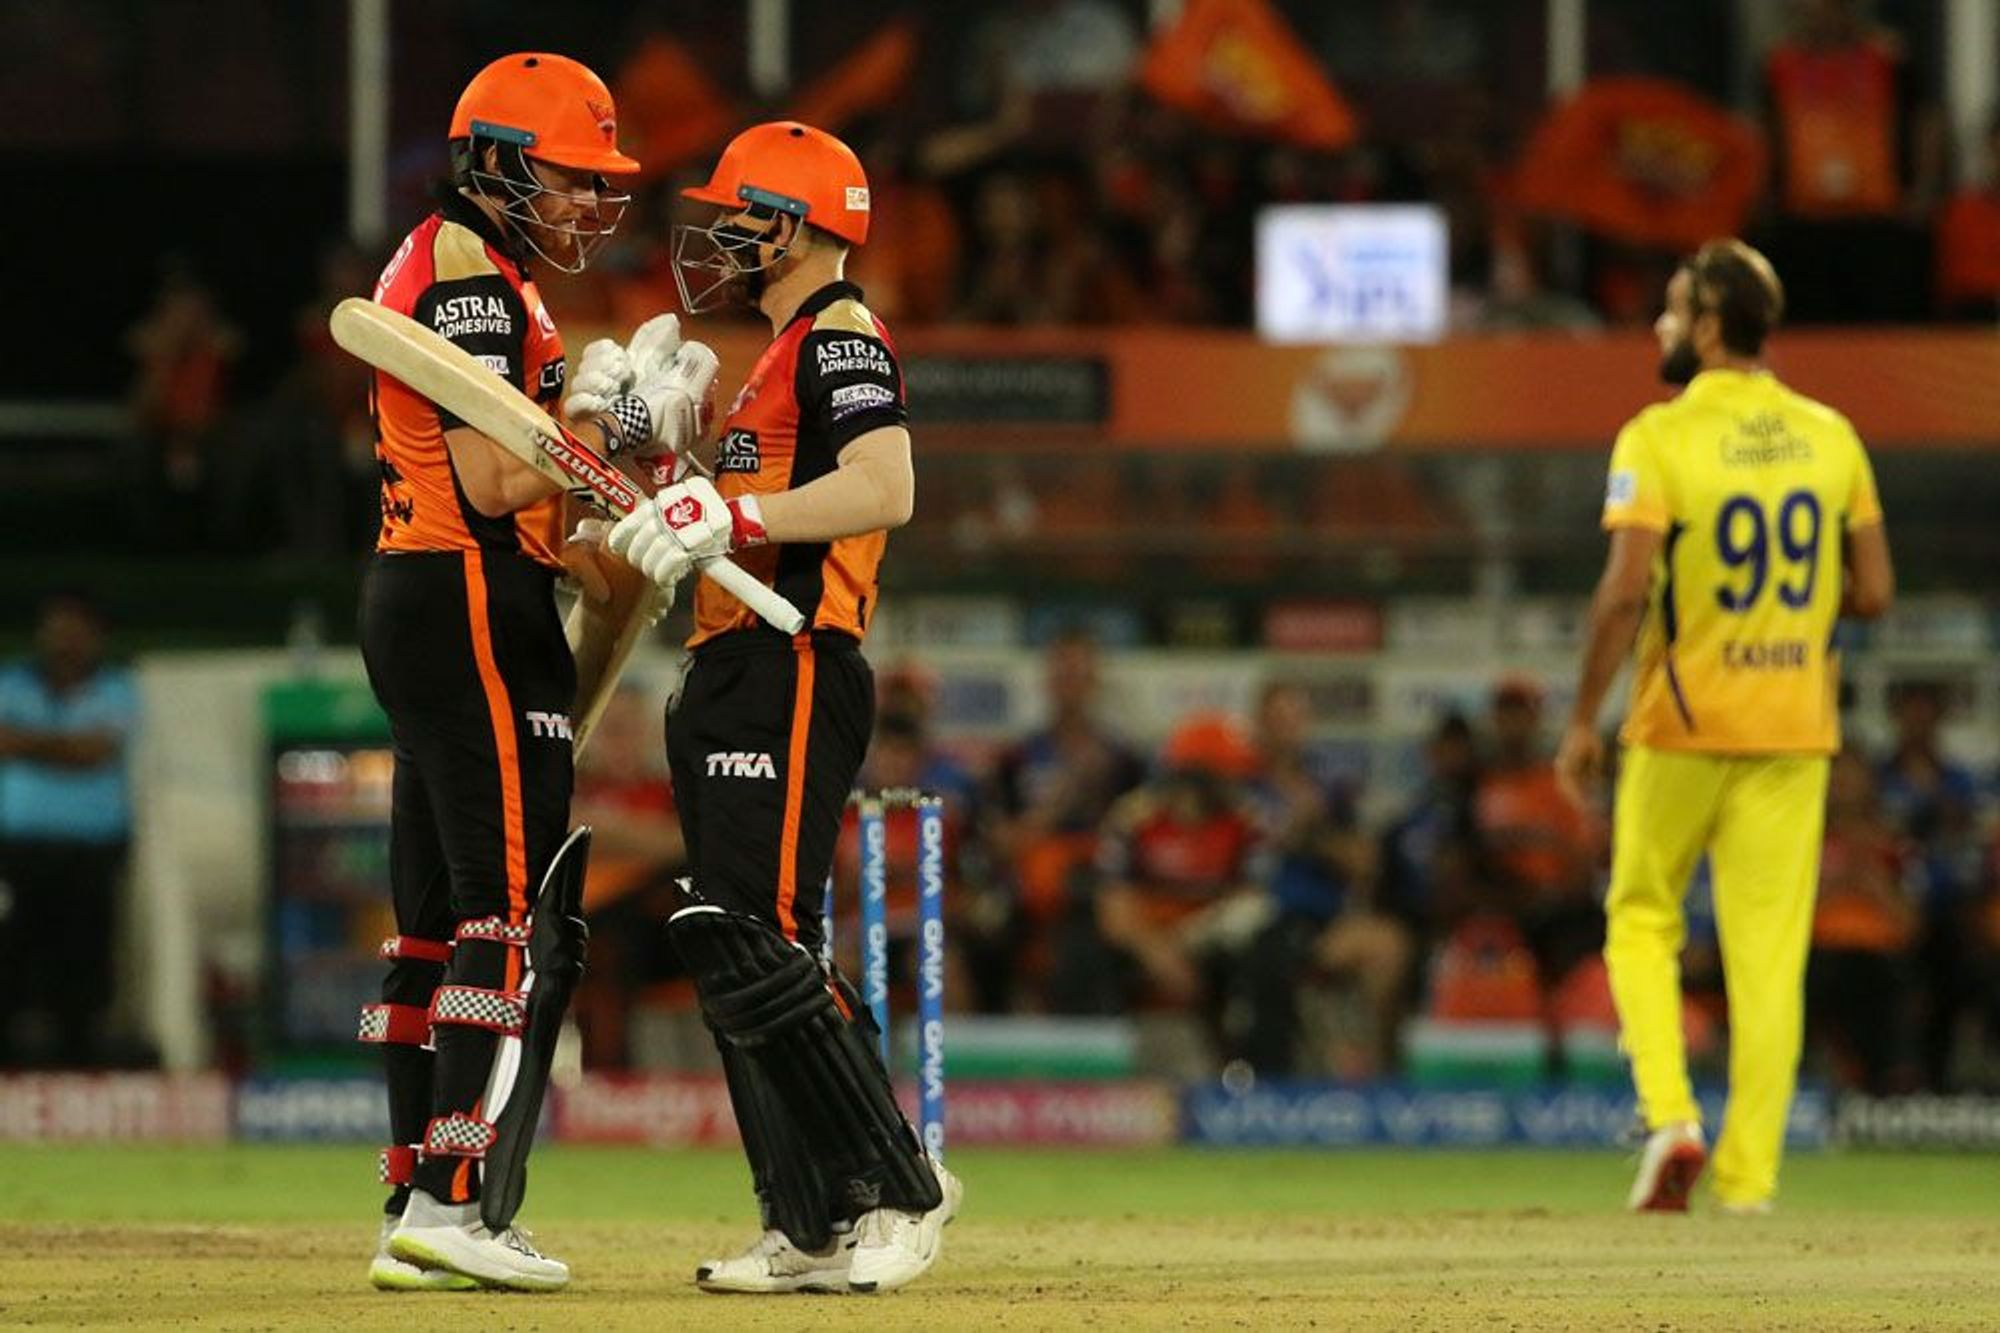 Ipl 2019 Sunrisers Hyderabad Vs Chennai Super Kings Live Updates